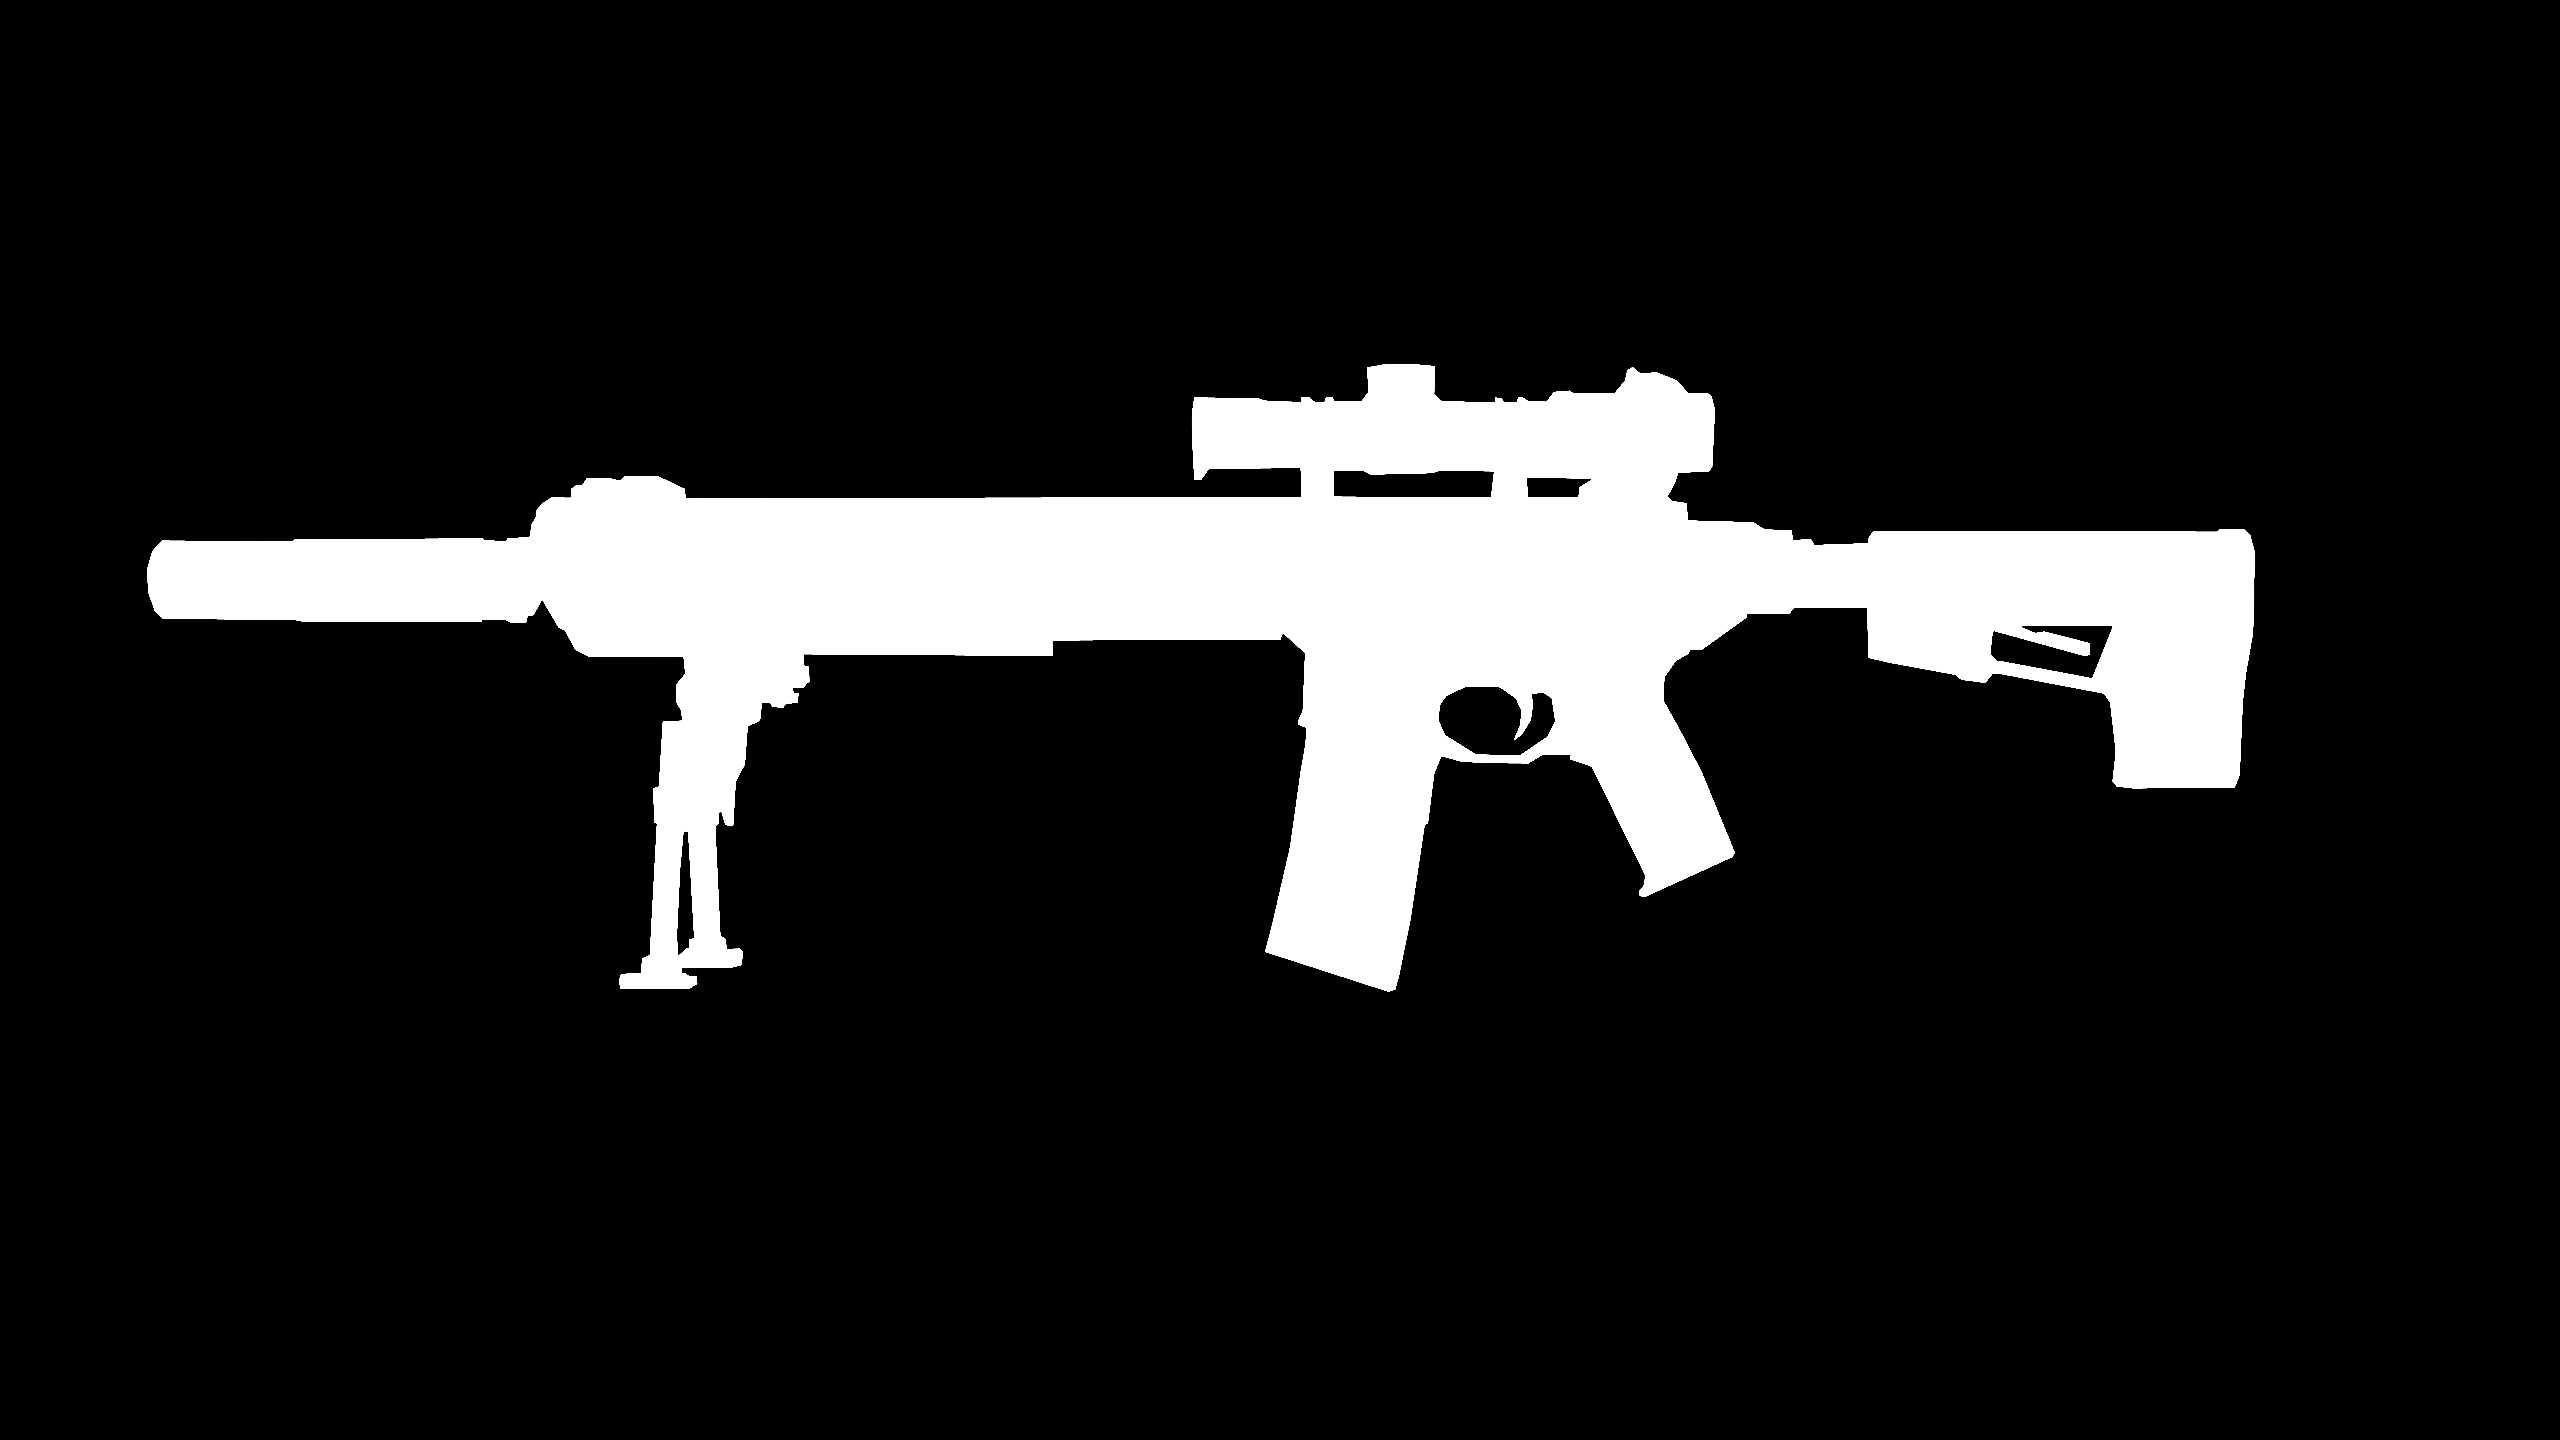 M13 Modifiziert umriss